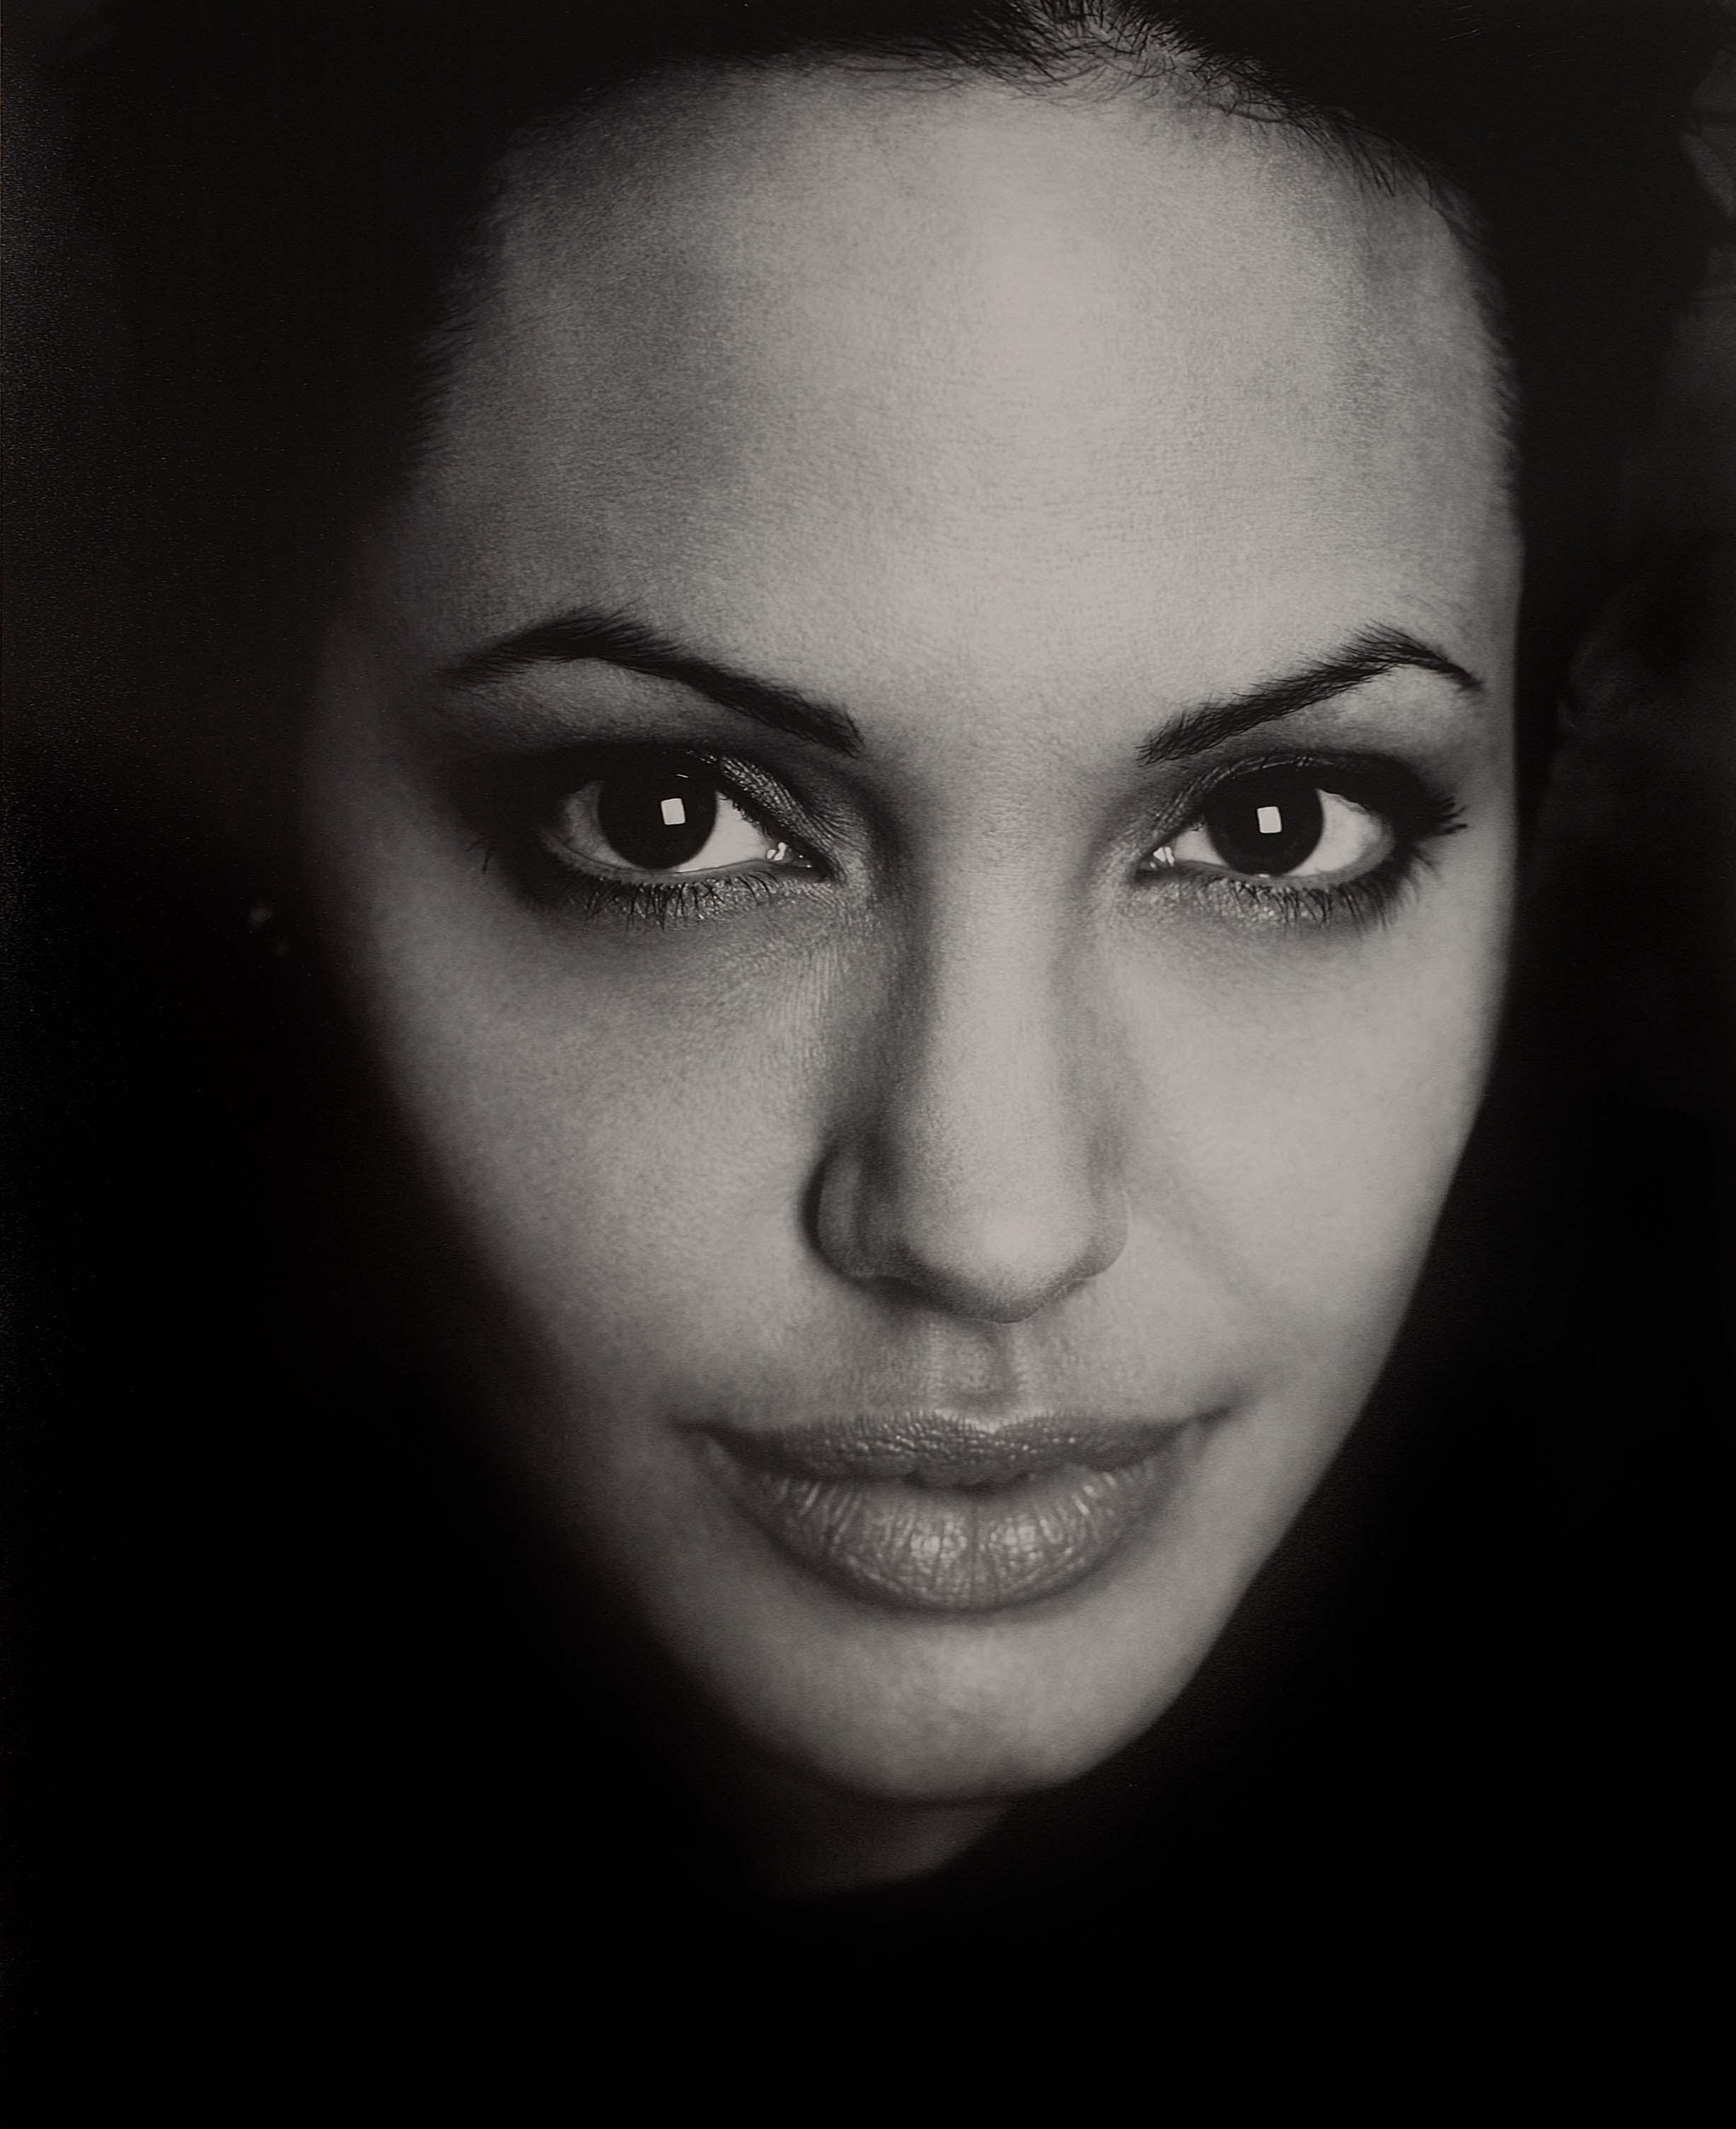 Angelina Jolie Monochrome Faces Greyscale Free Wallpaper Wallpaperjam Com